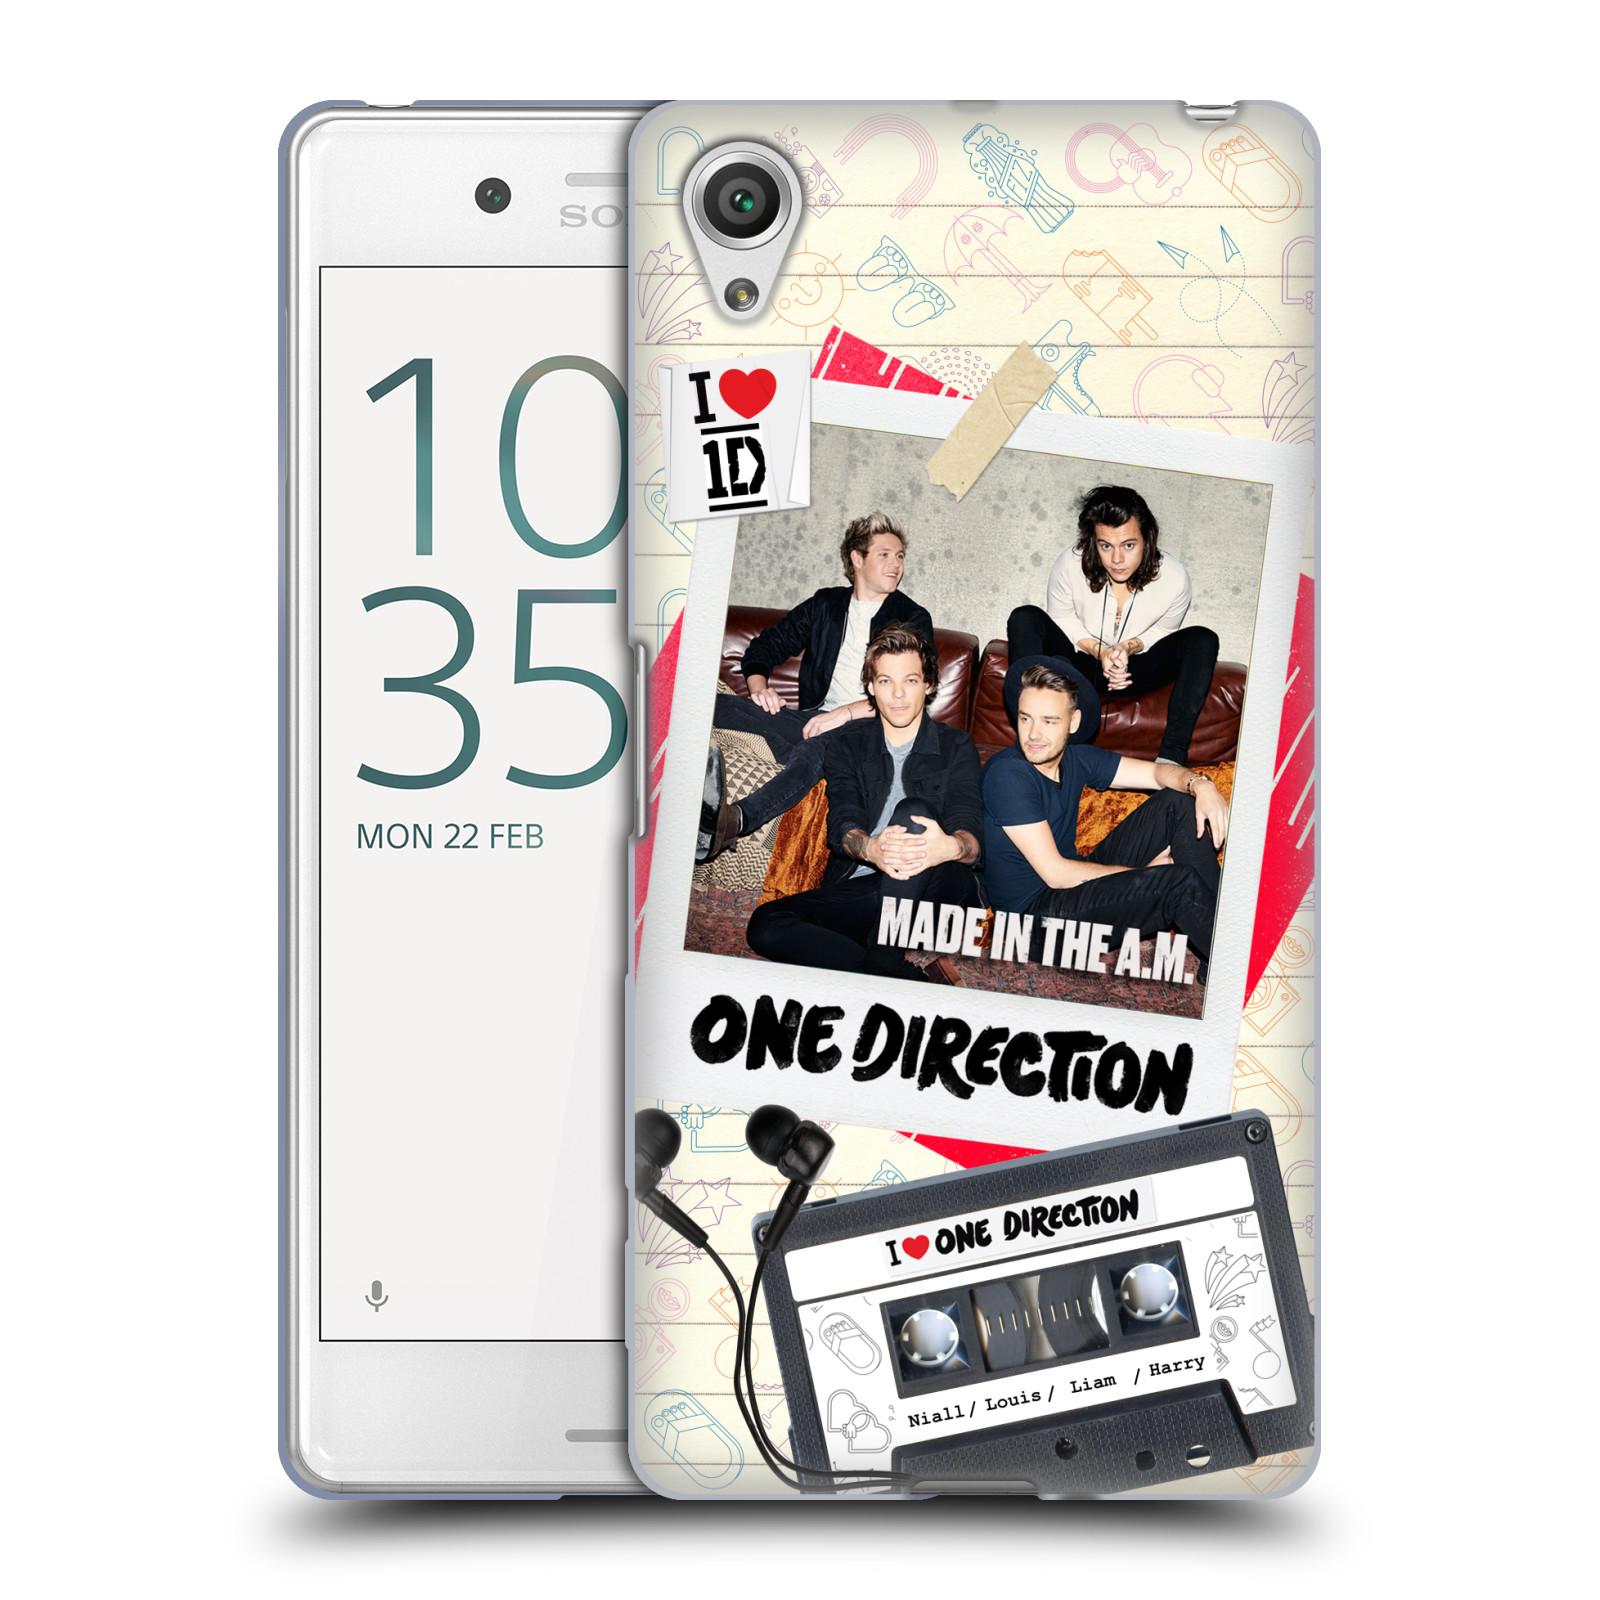 Silikonové pouzdro na mobil Sony Xperia X Performance HEAD CASE One Direction - Kazeta (Silikonový kryt či obal One Direction Official na mobilní telefon Sony Xperia X Performance F8132)